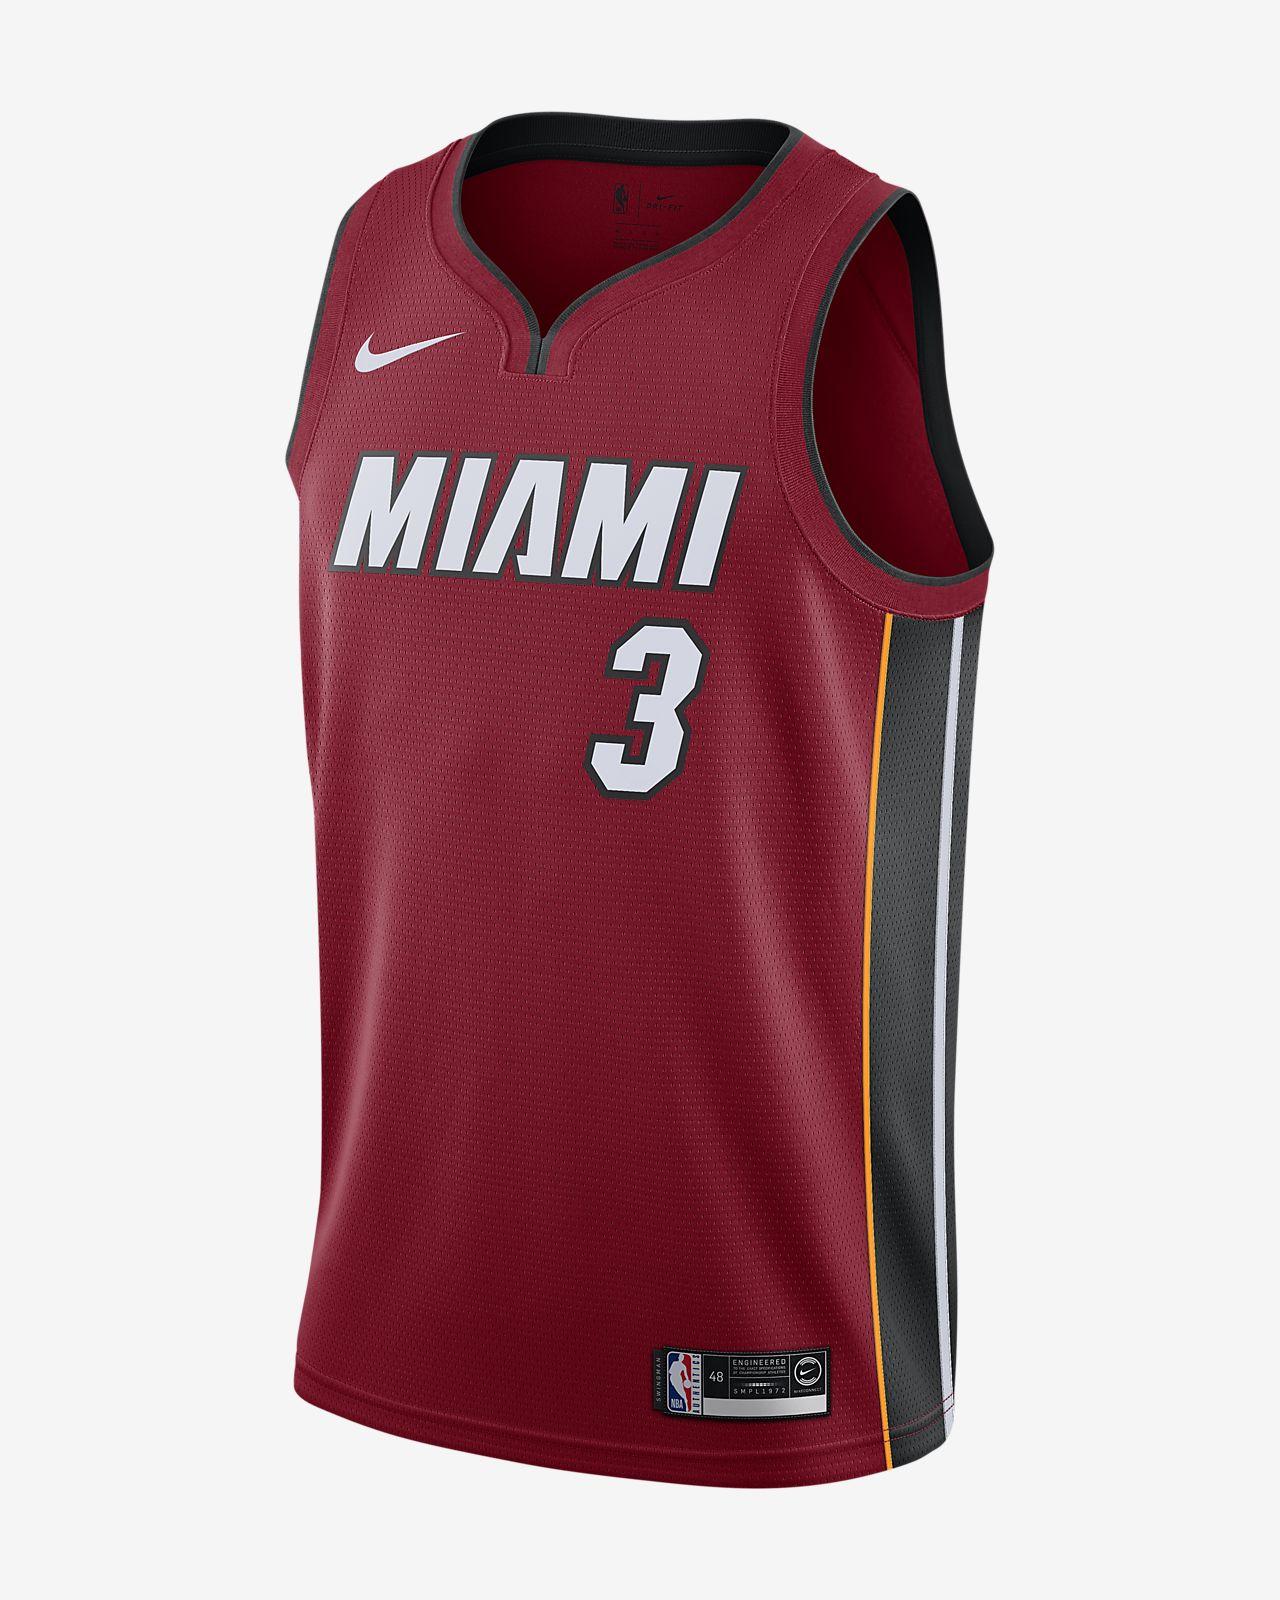 Dwyane Wade Heat Statement Edition Nike NBA Swingman Jersey